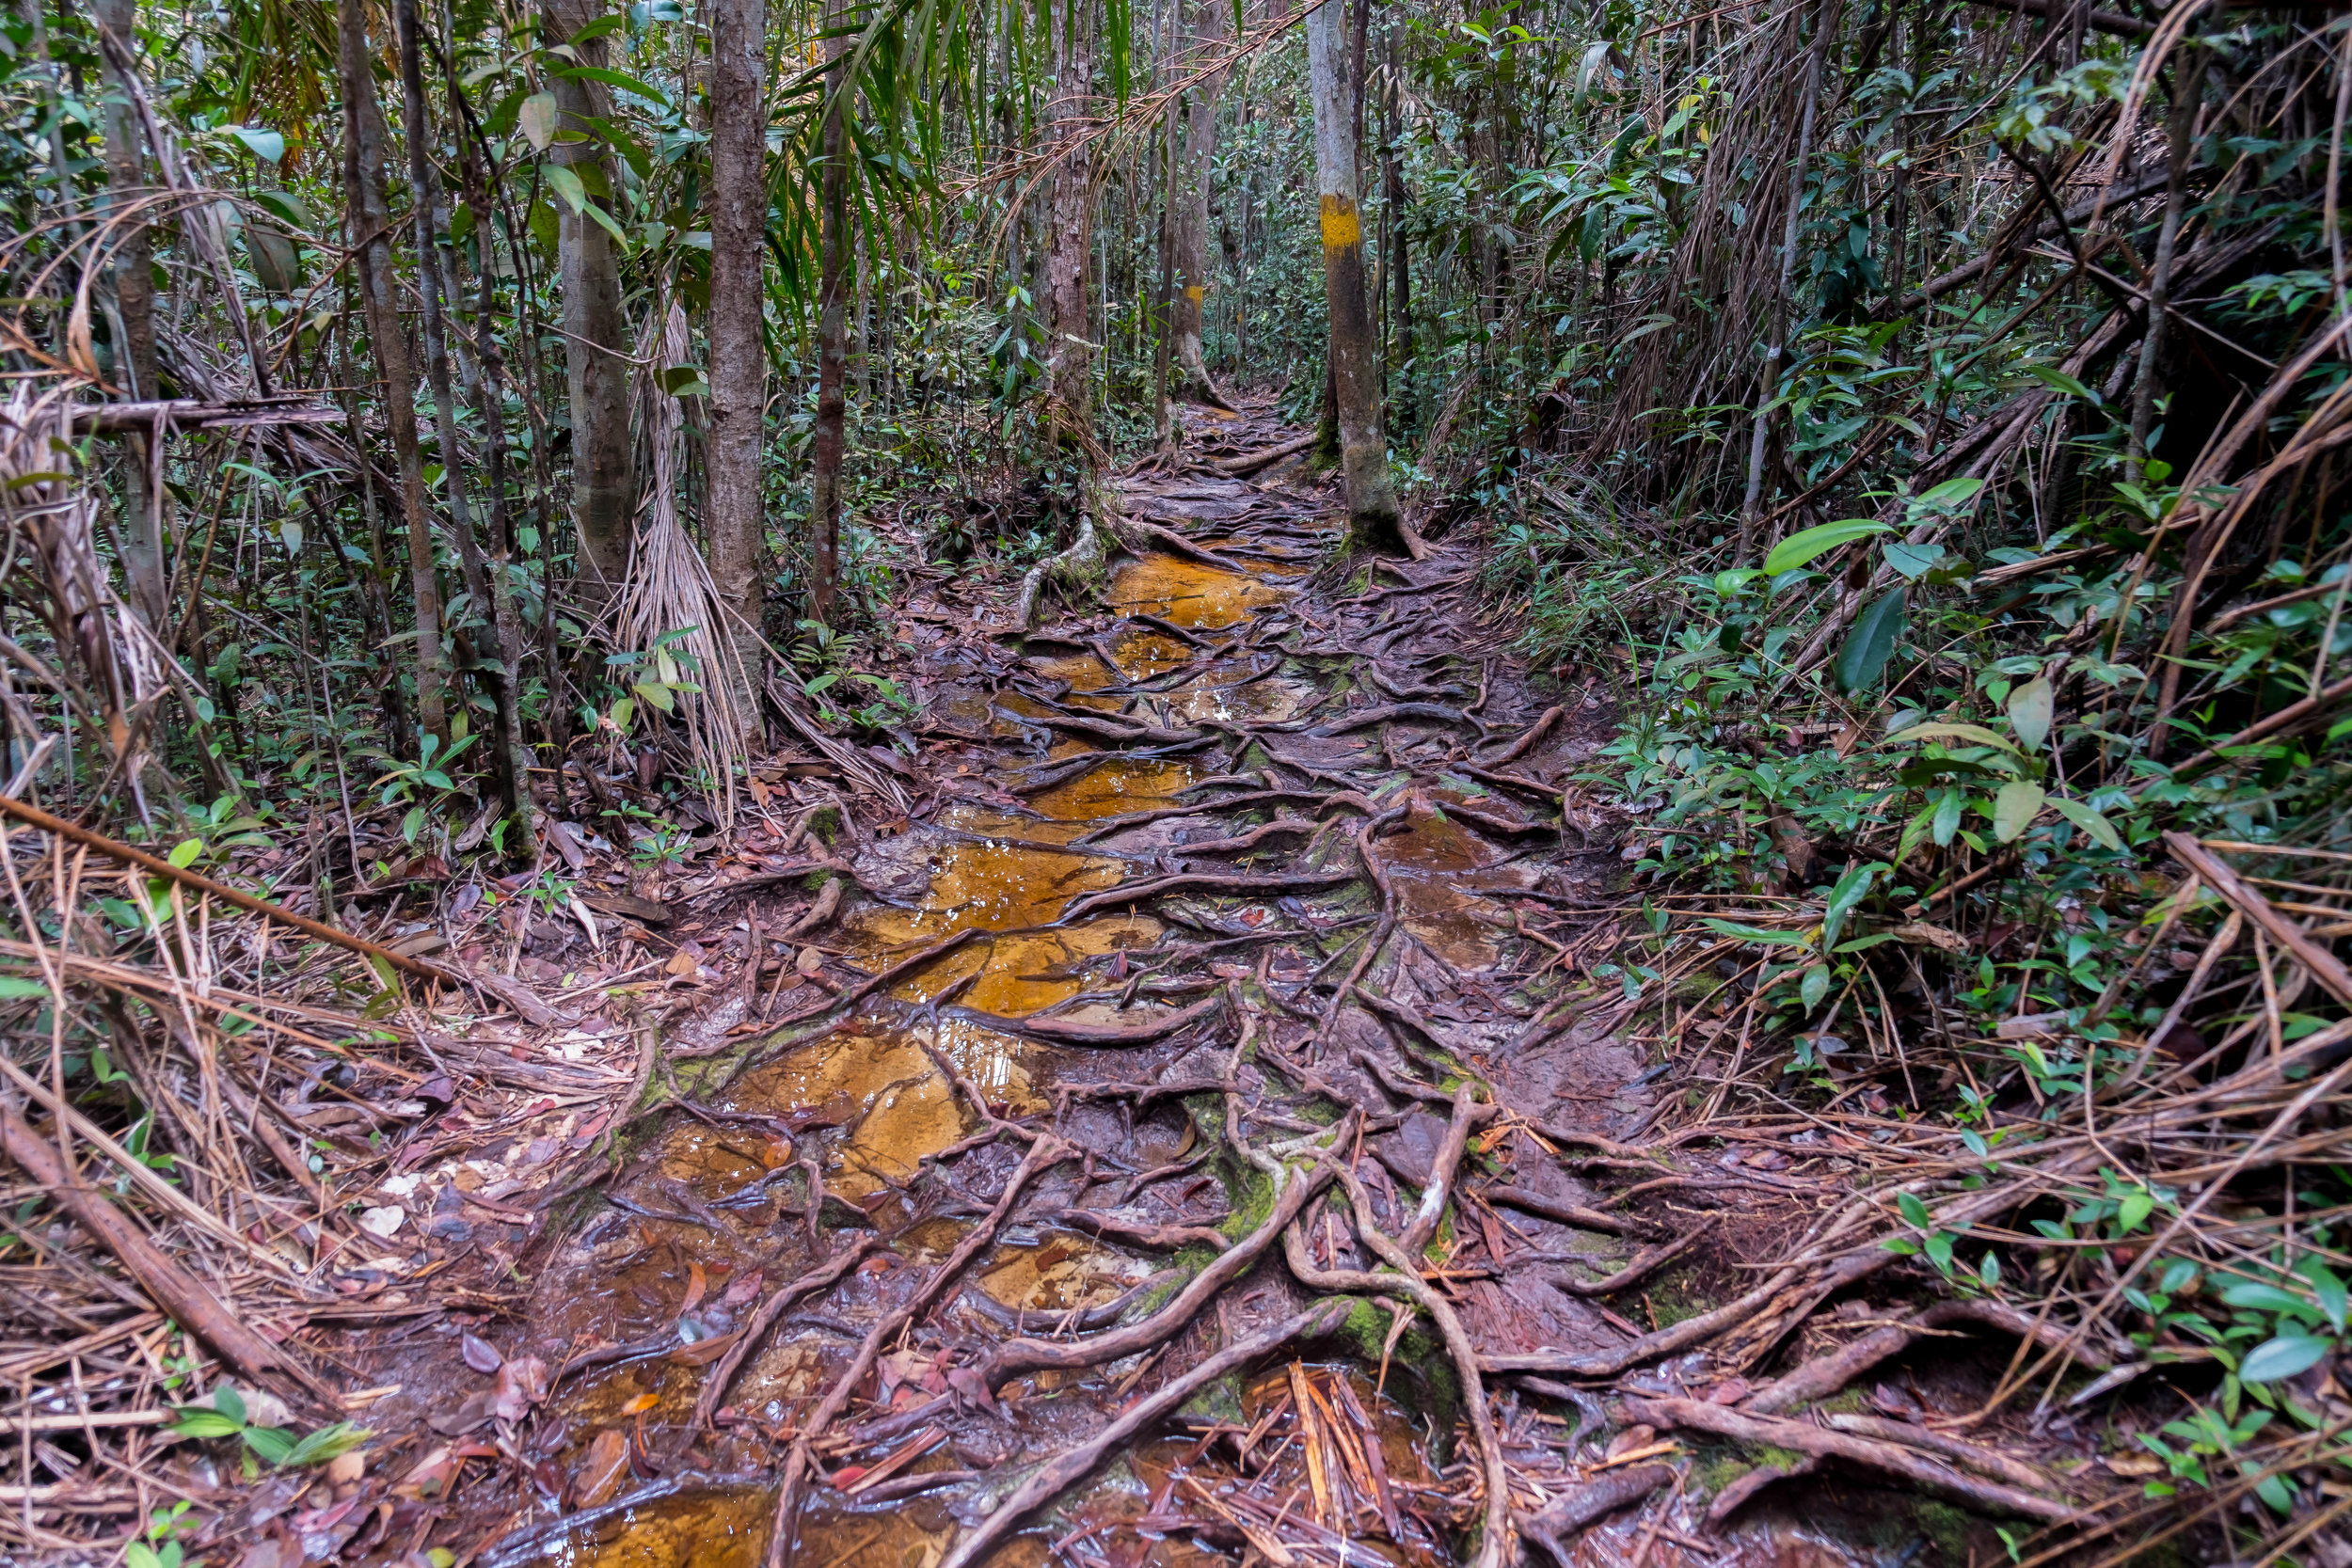 The trails inside Bako National Park